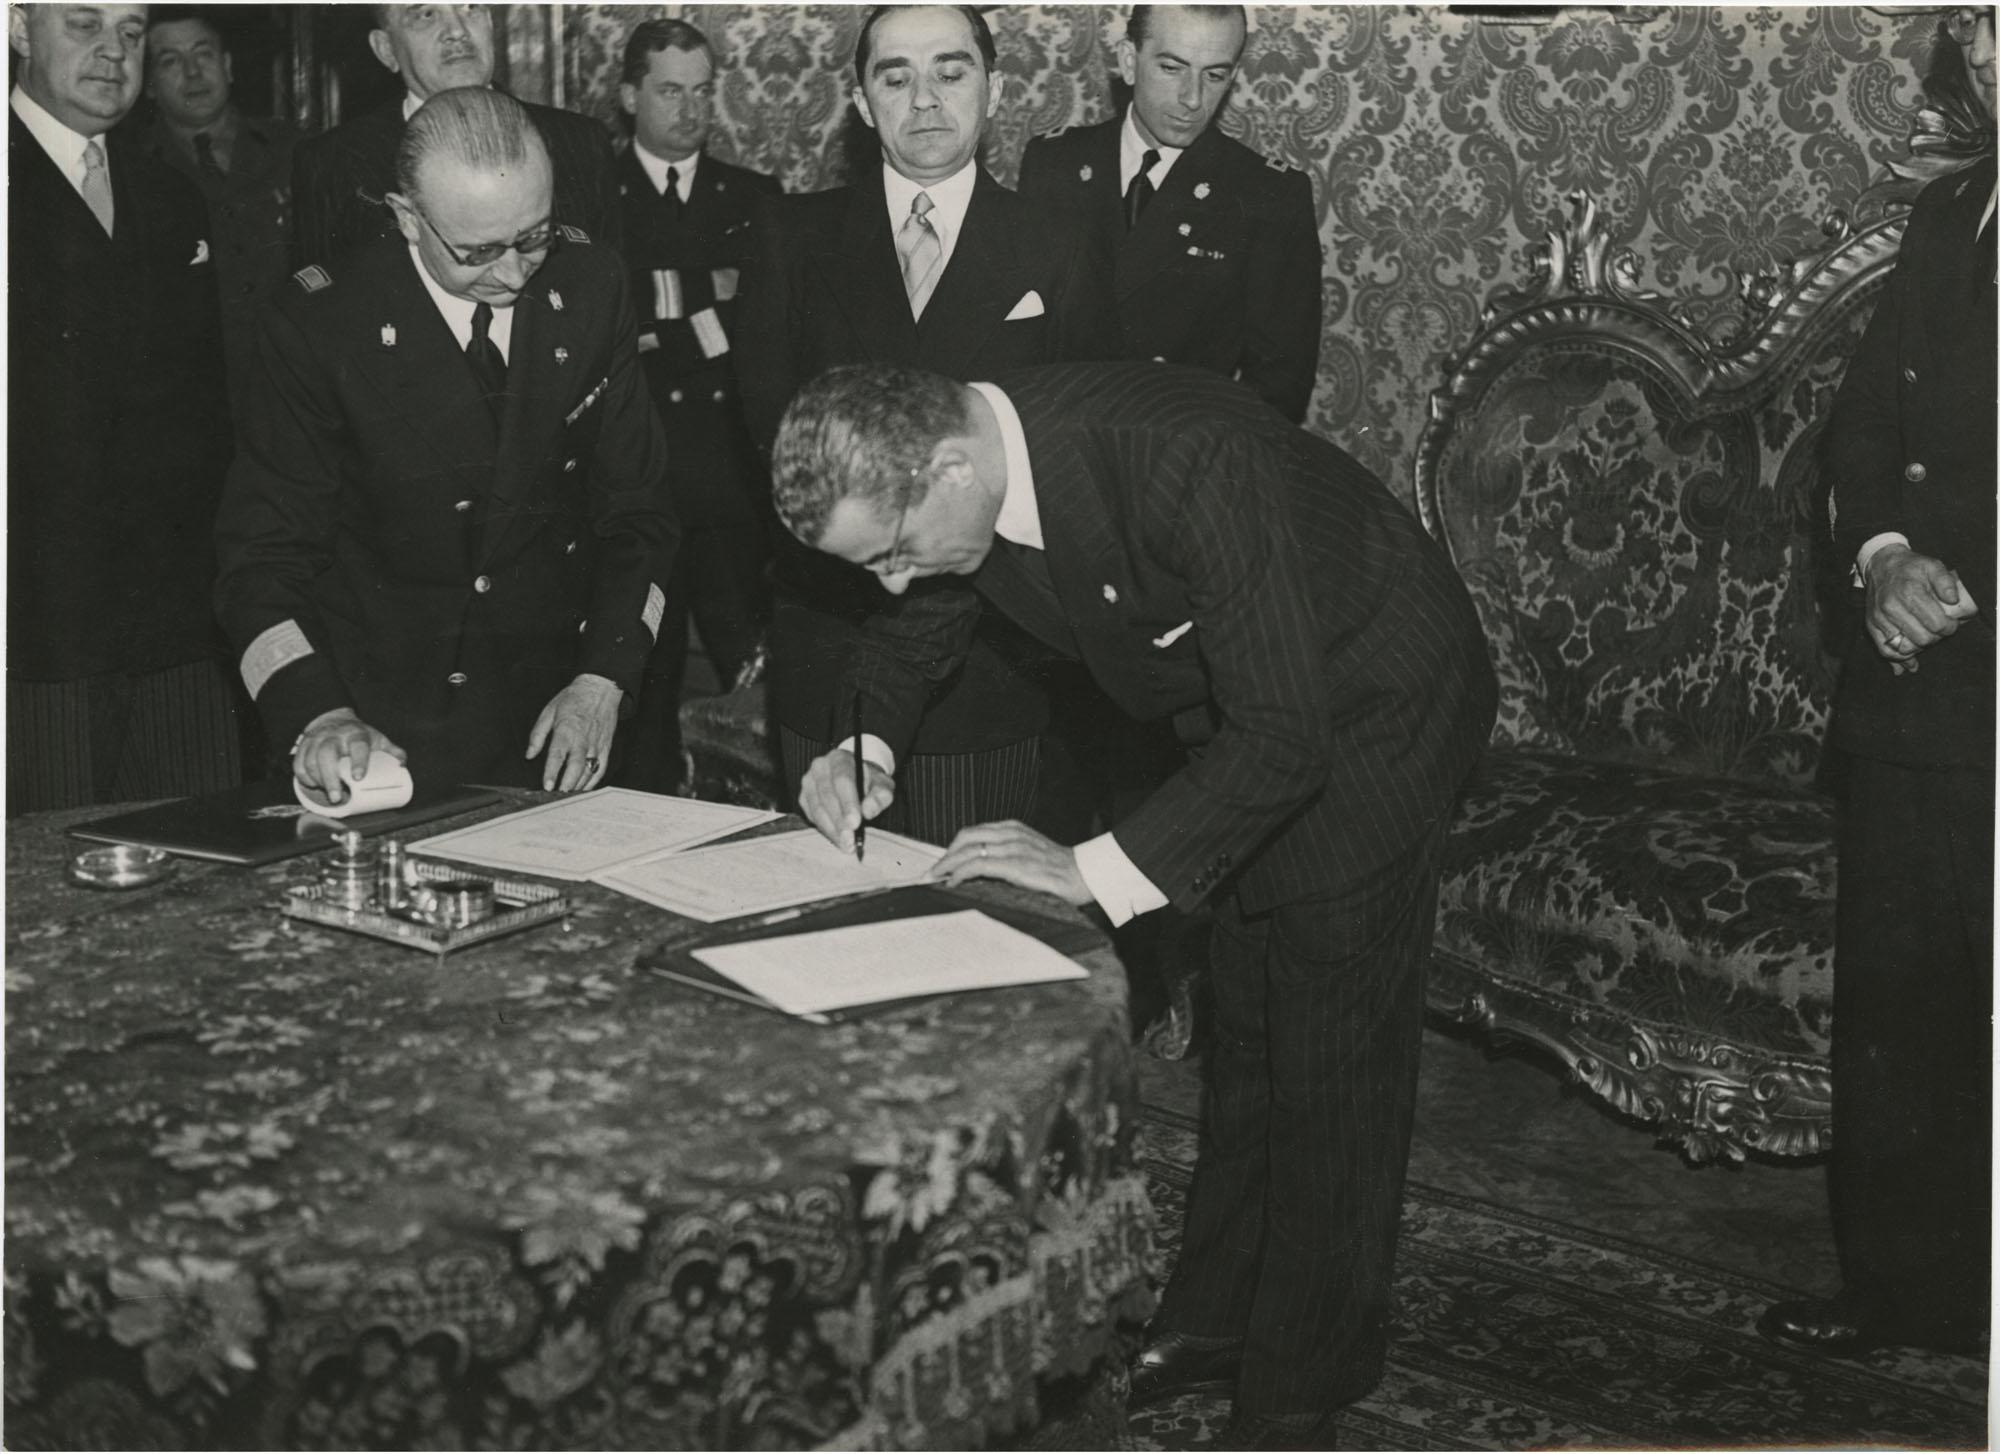 Mihai Antonescu's visit to Benito Mussolini, Photograph 45